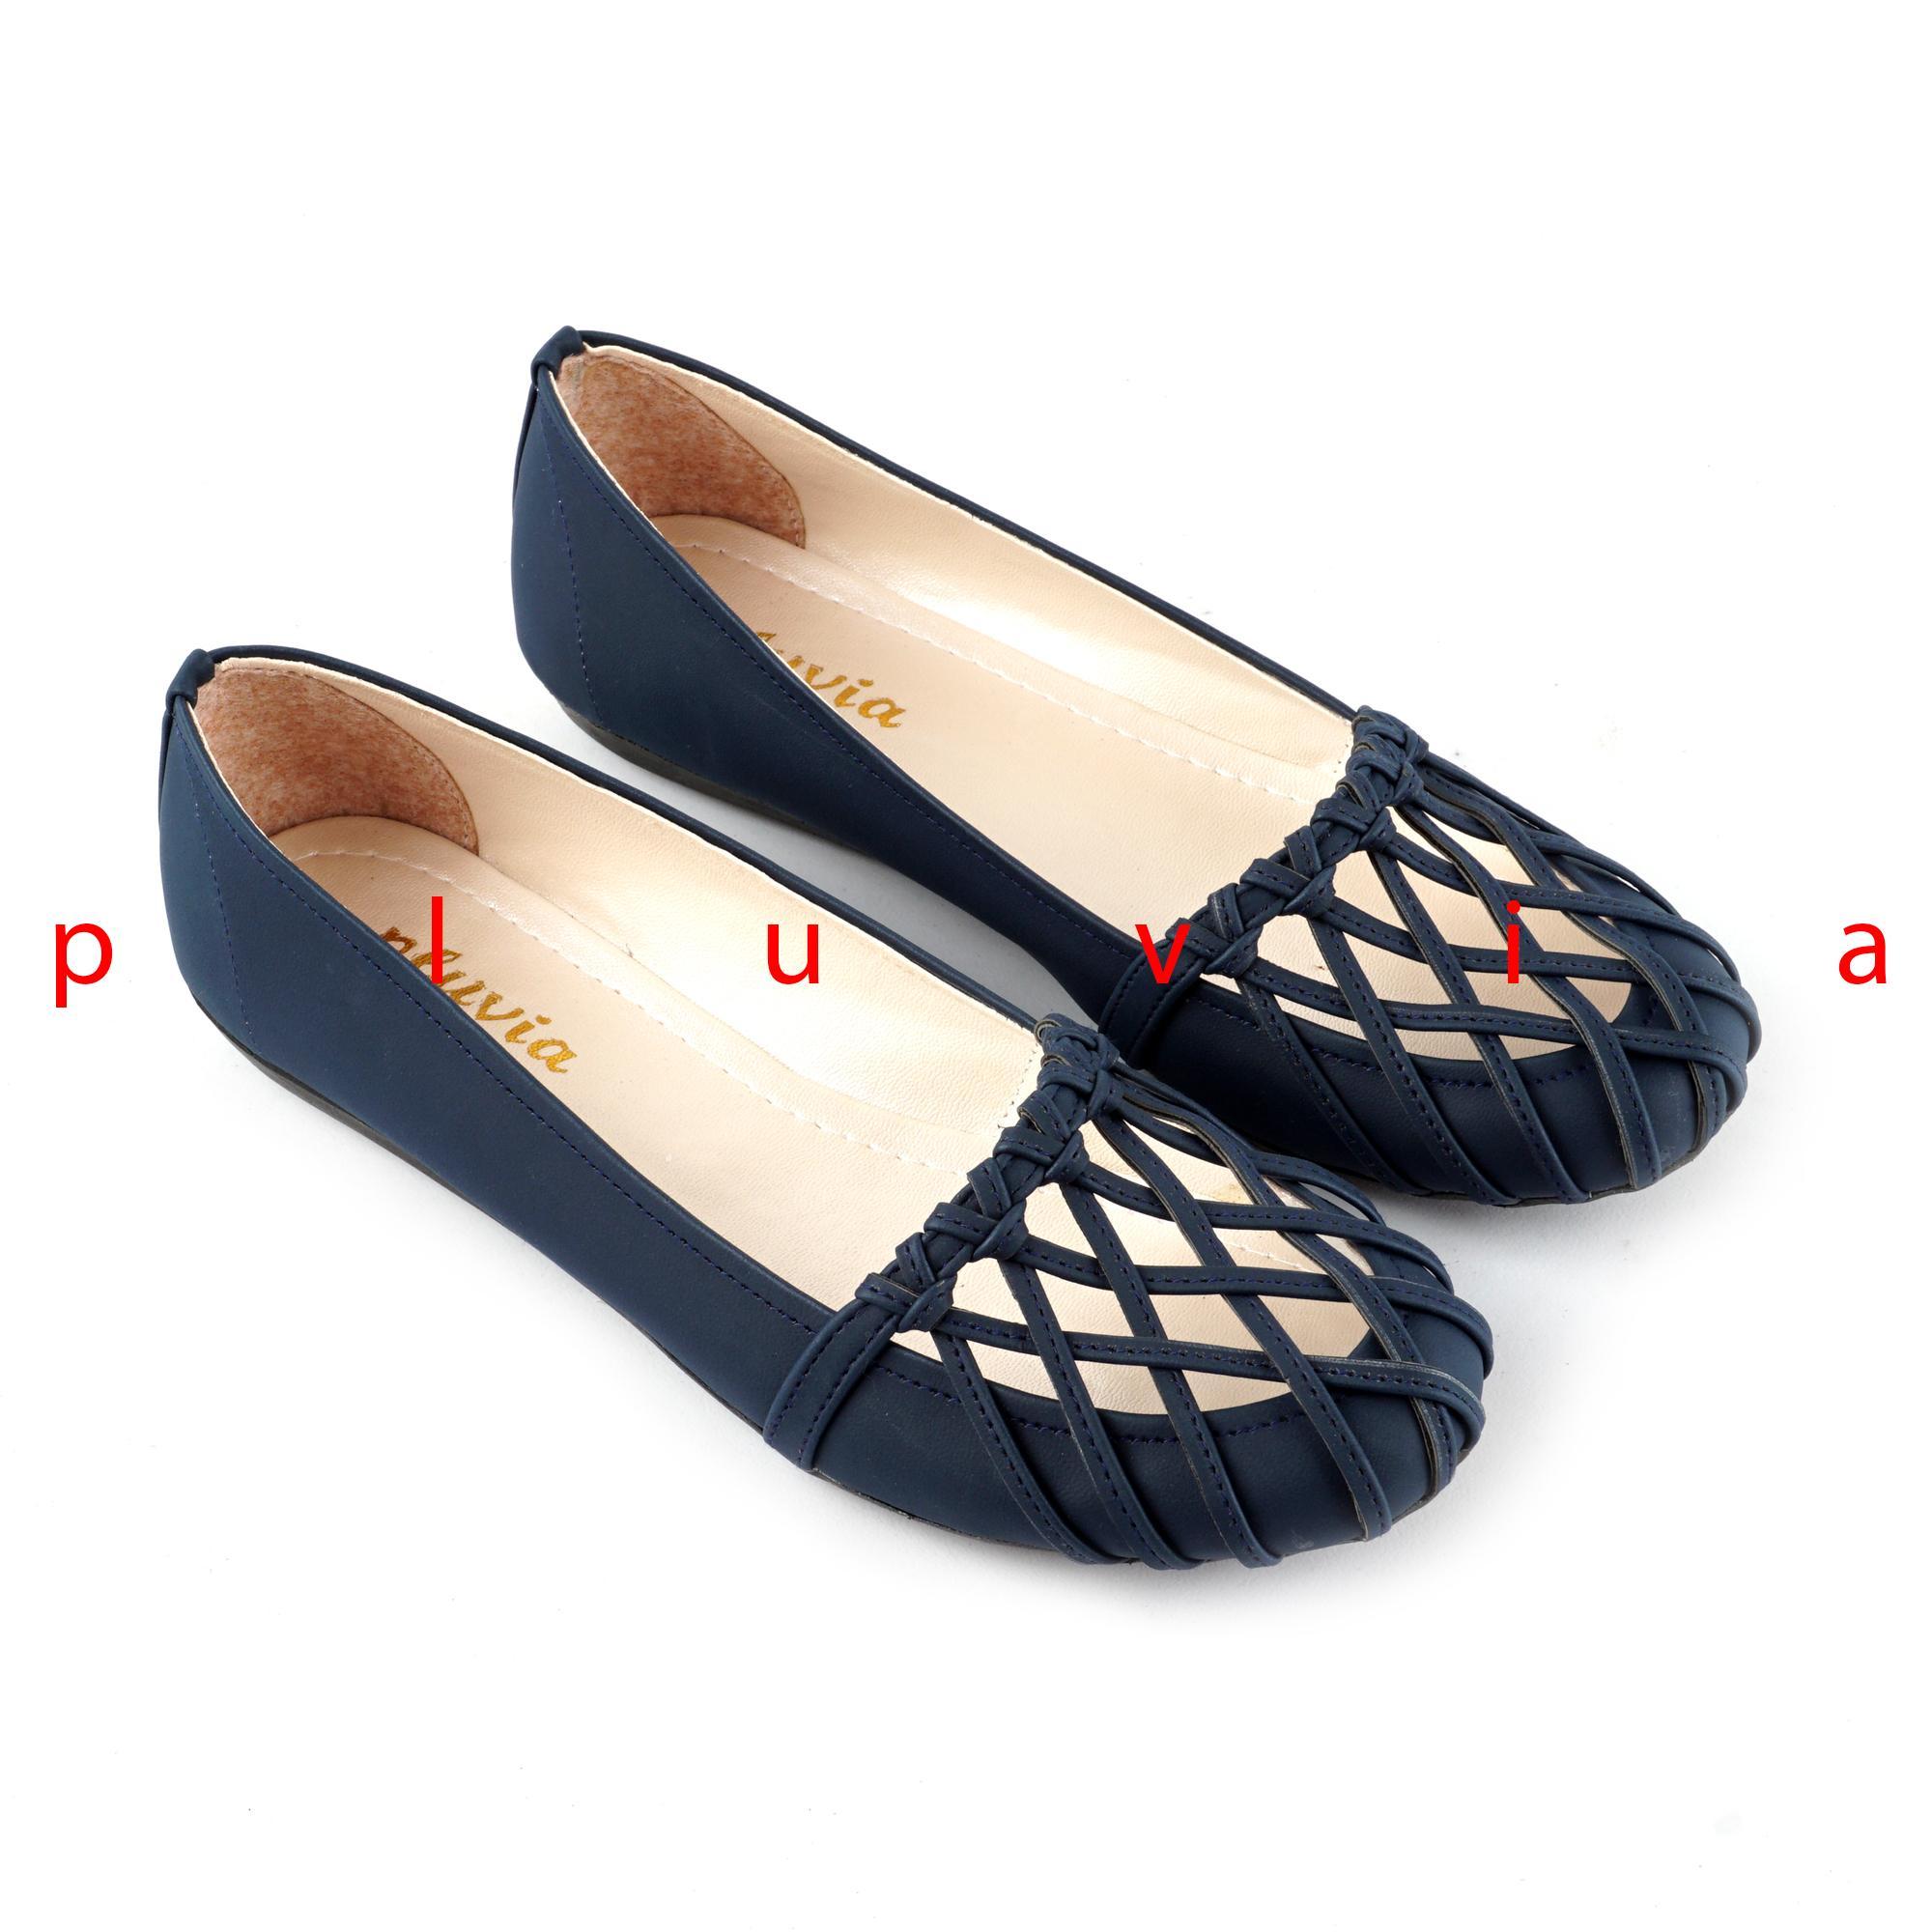 Pluvia - Sepatu Balet Flat Shoes Slip On Wanita PLV74 - Navy 9d3670f4c4